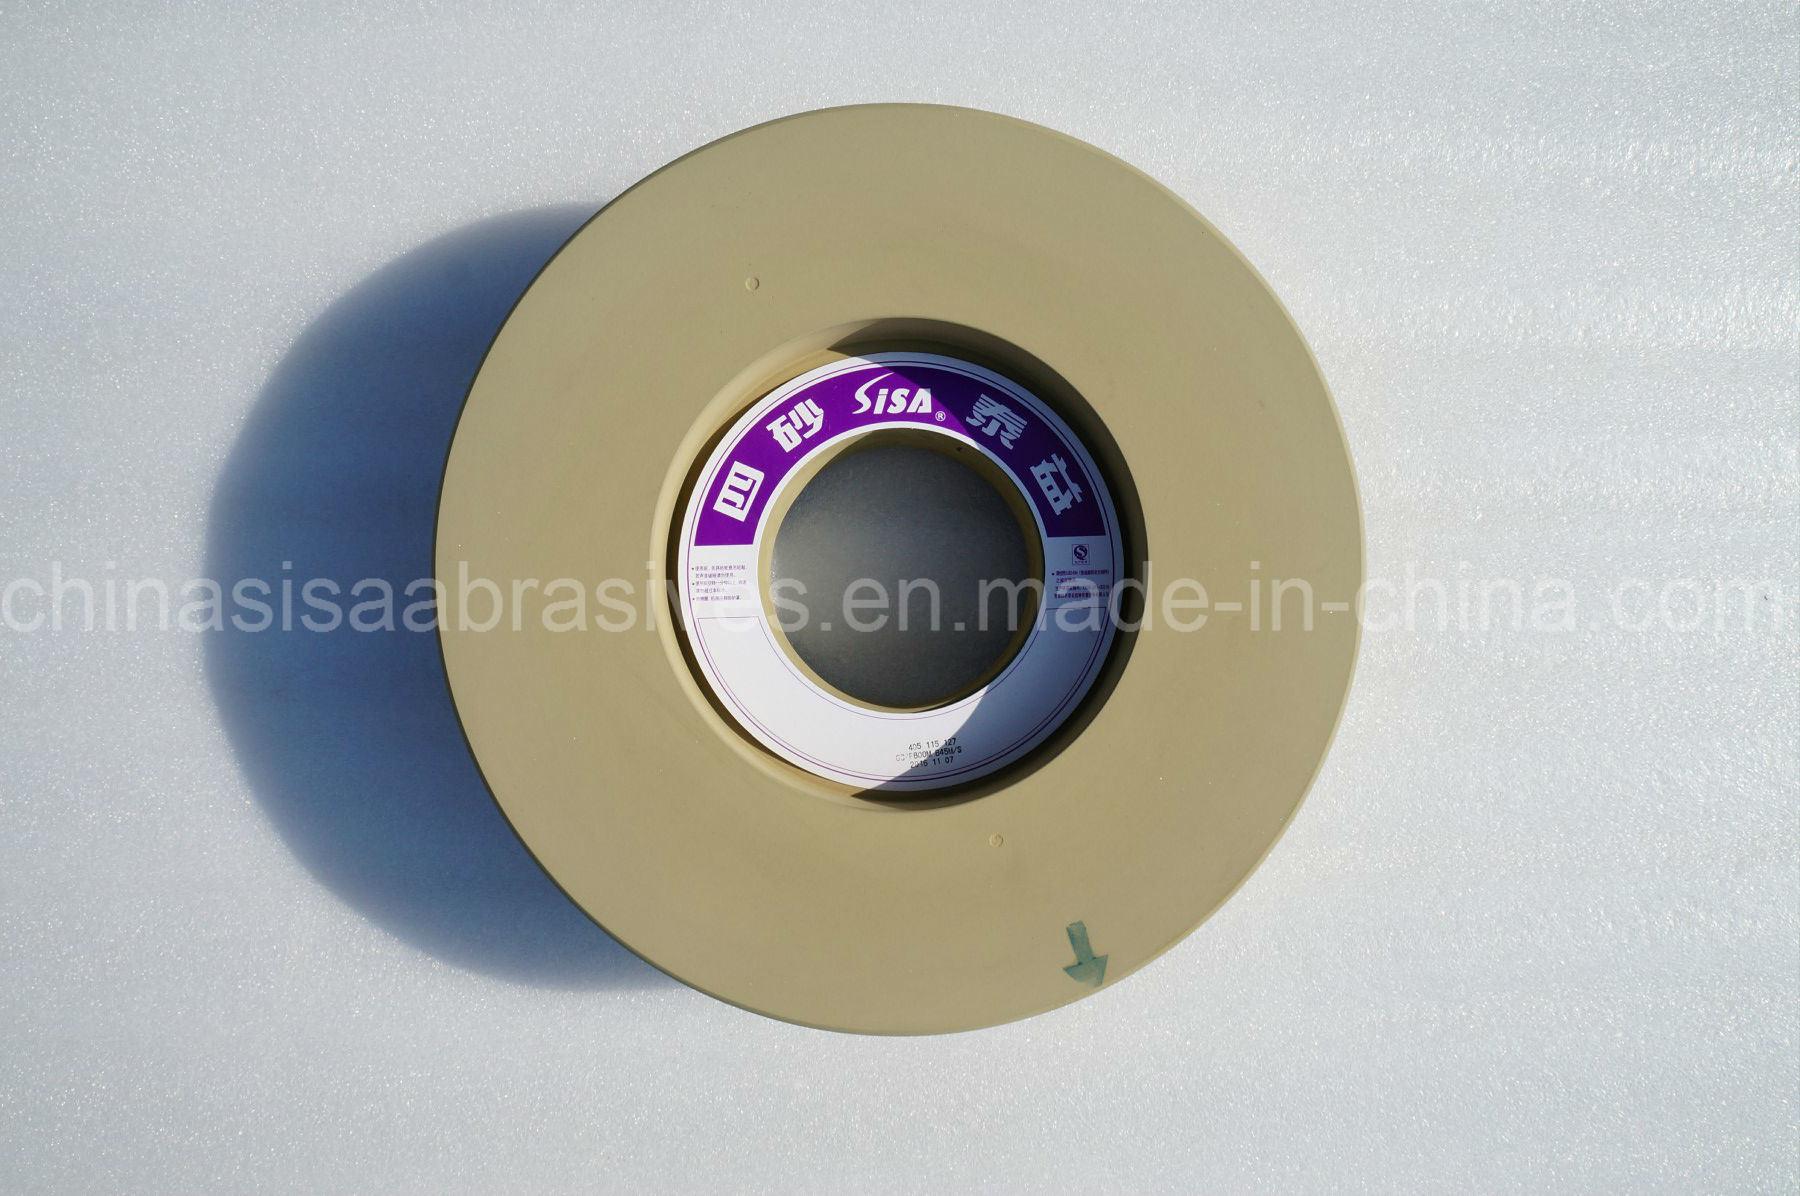 Sisa Precision Needle Tip Grinding Wheel